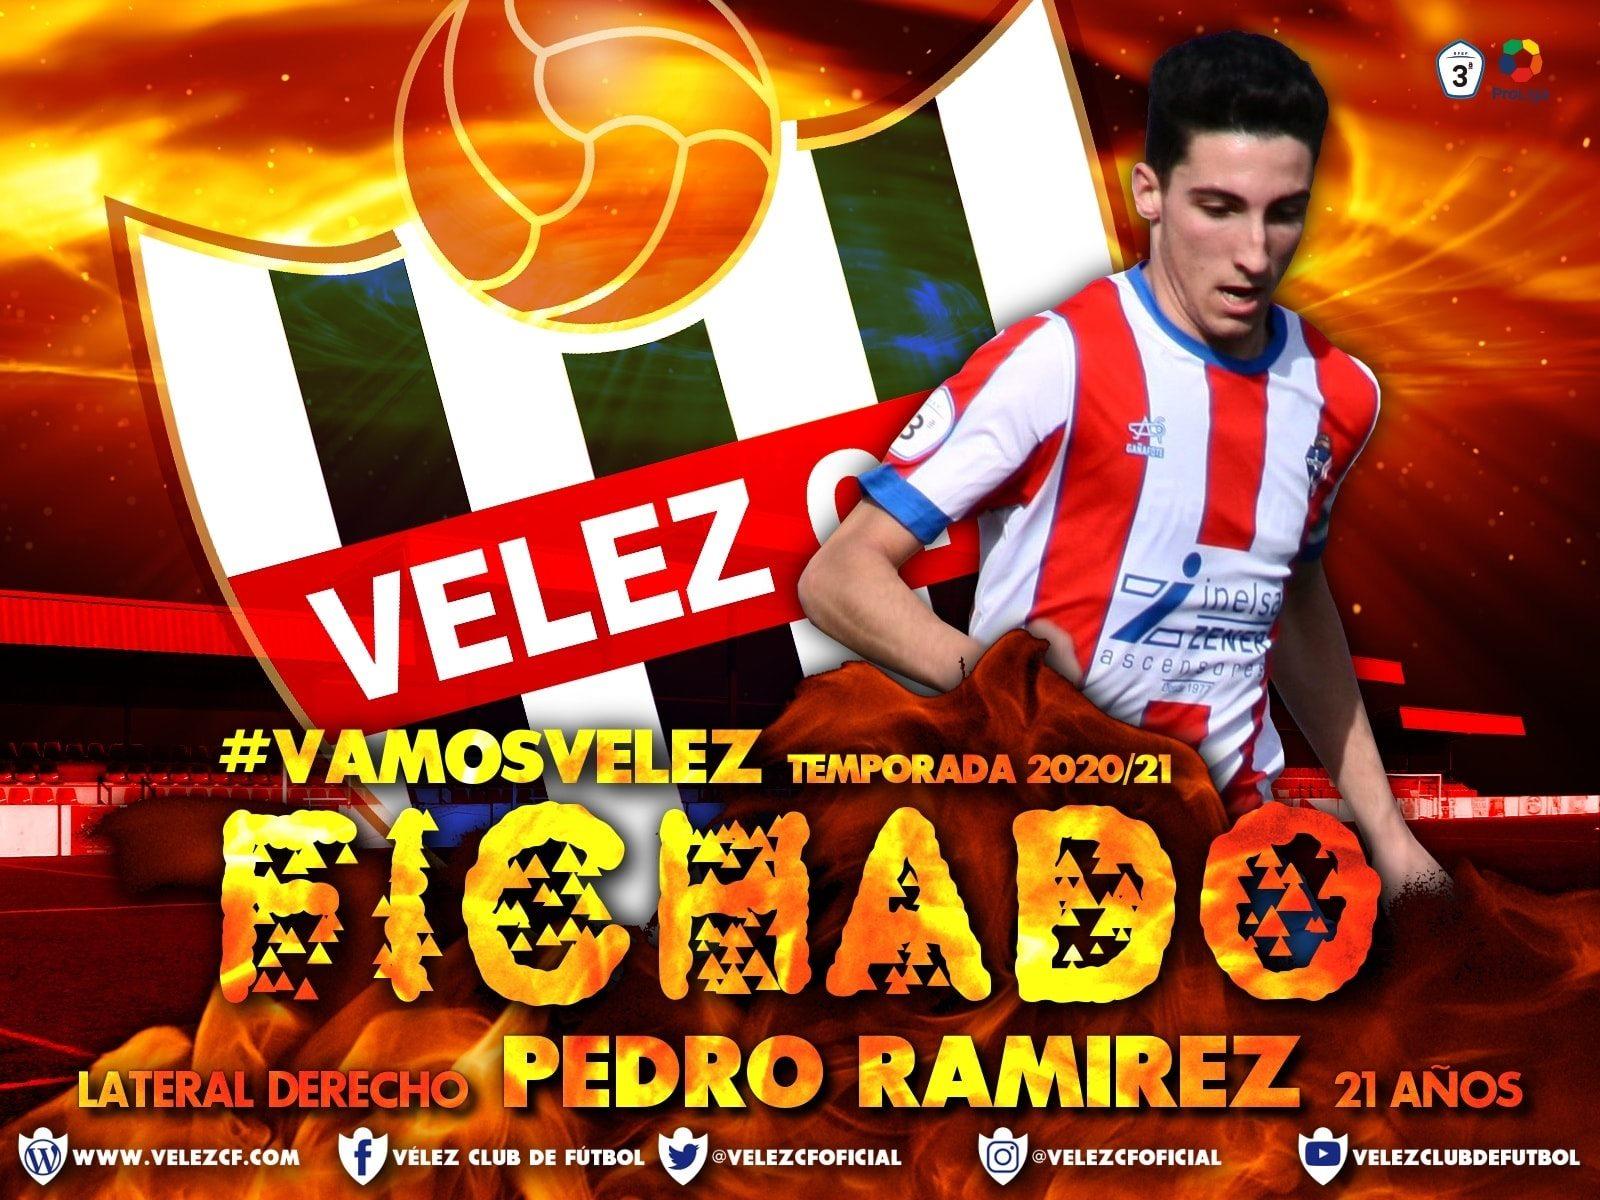 Velez C.F. Fichado Lateral Derecho Pedro Ramirez